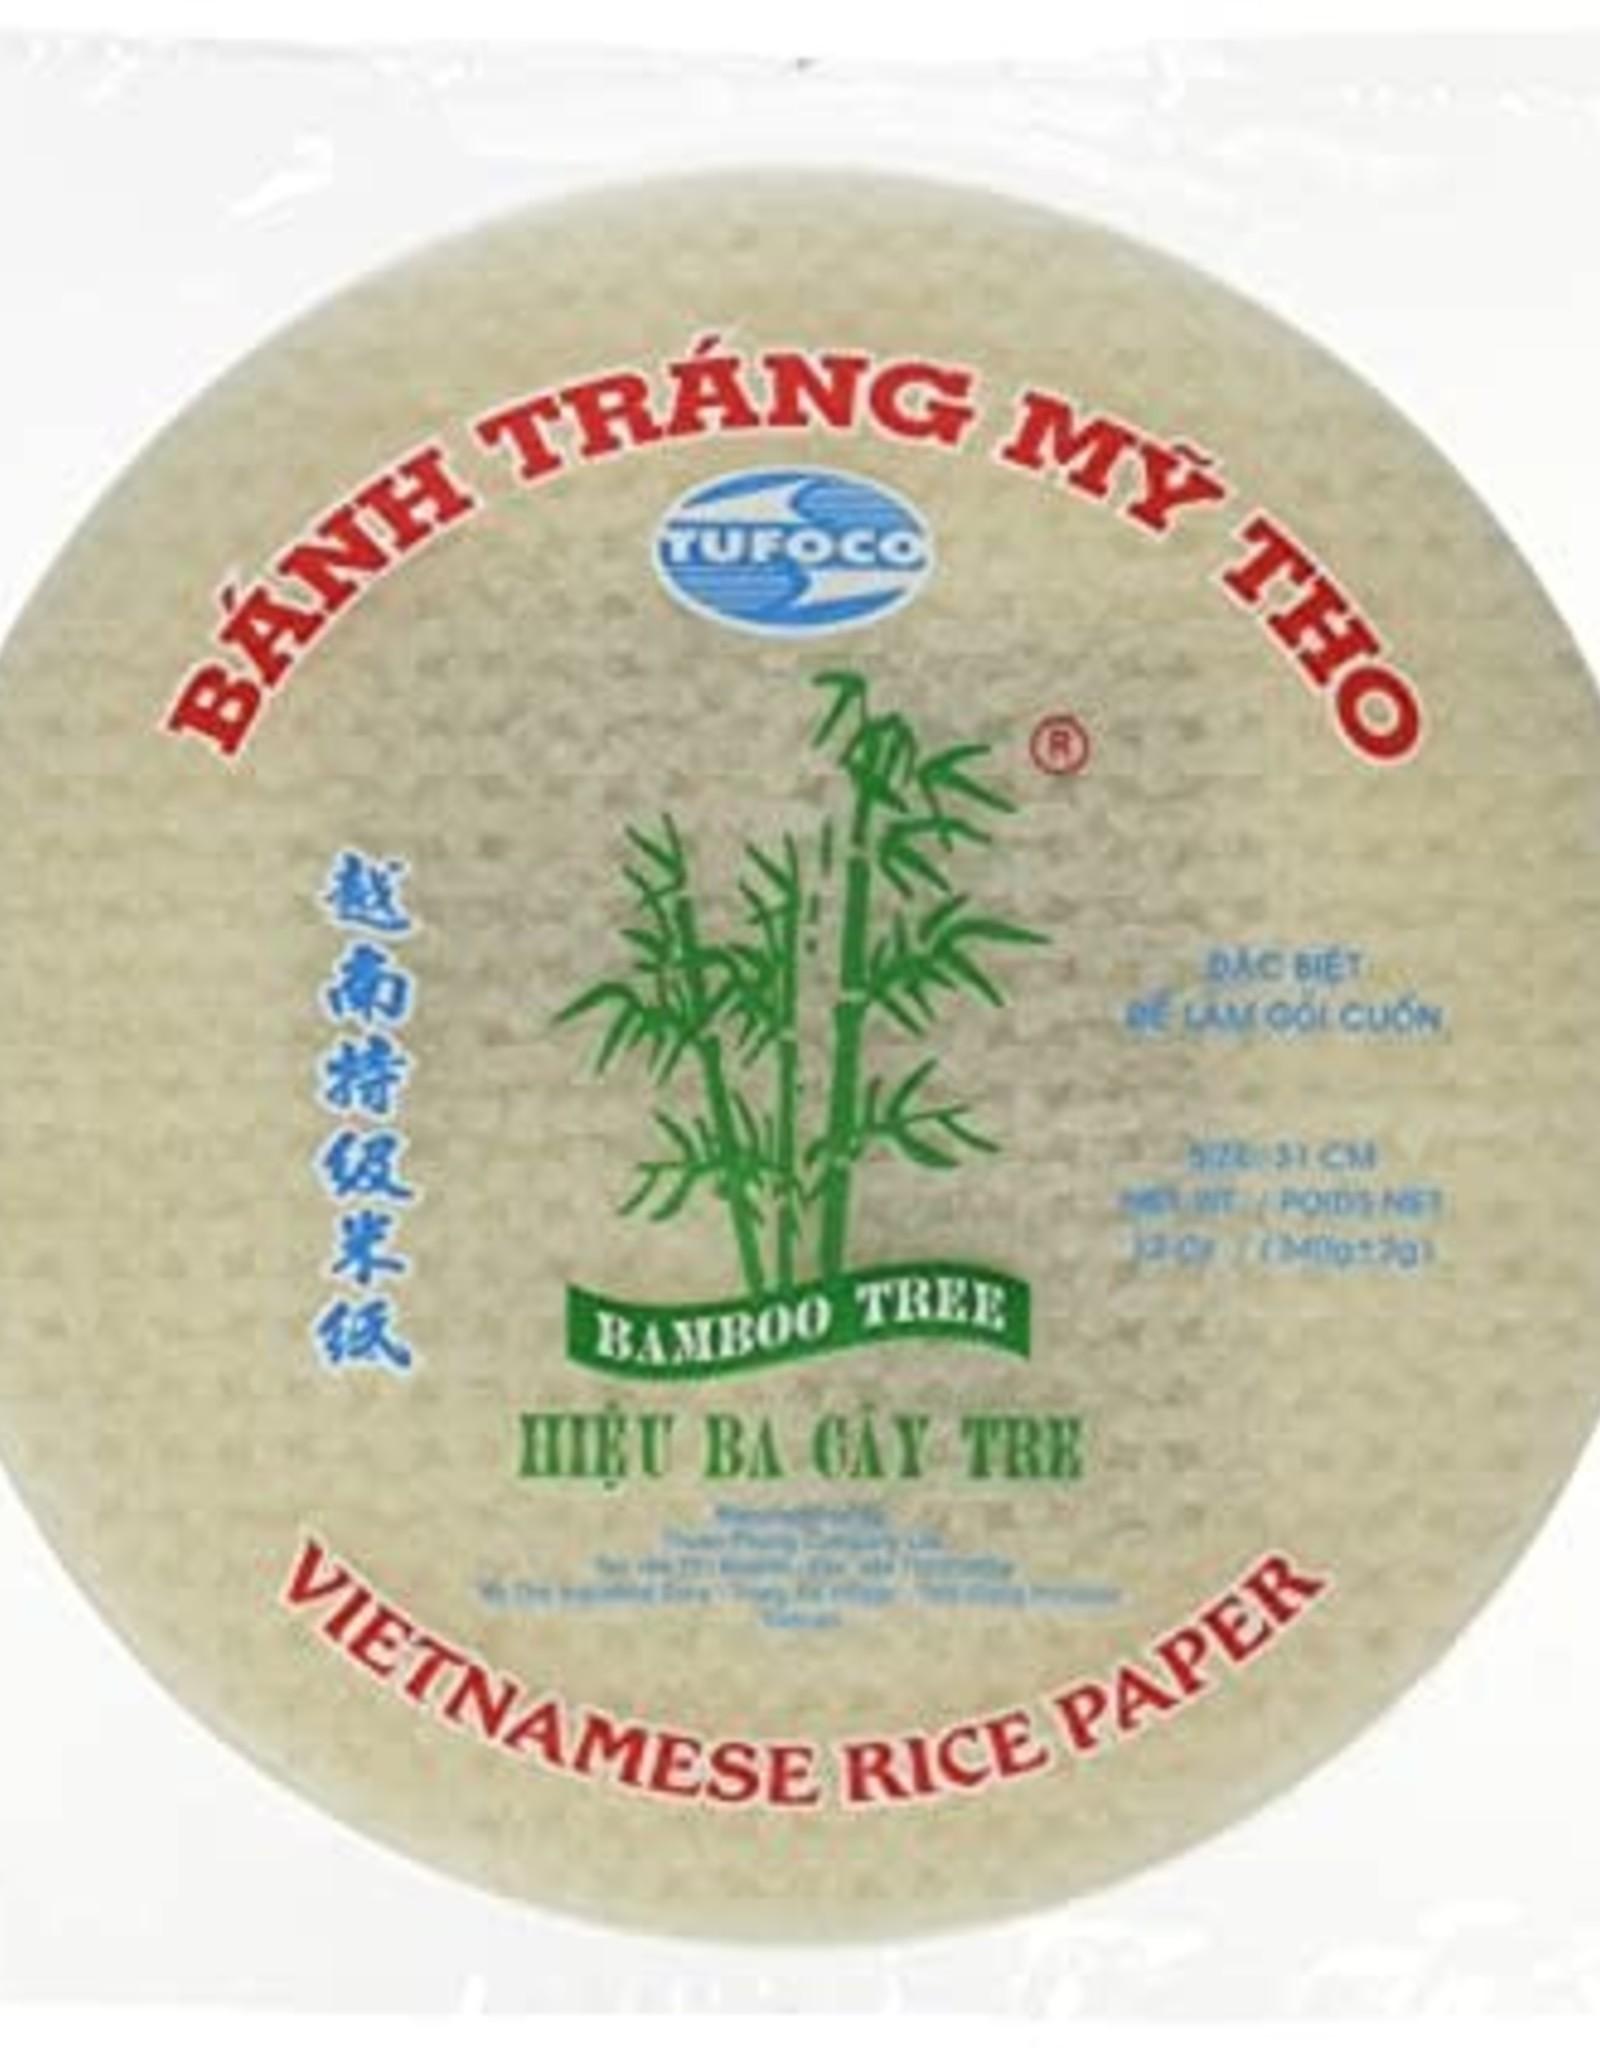 Rice Paper 31 Cm 340 Gr  Bamboo Tree